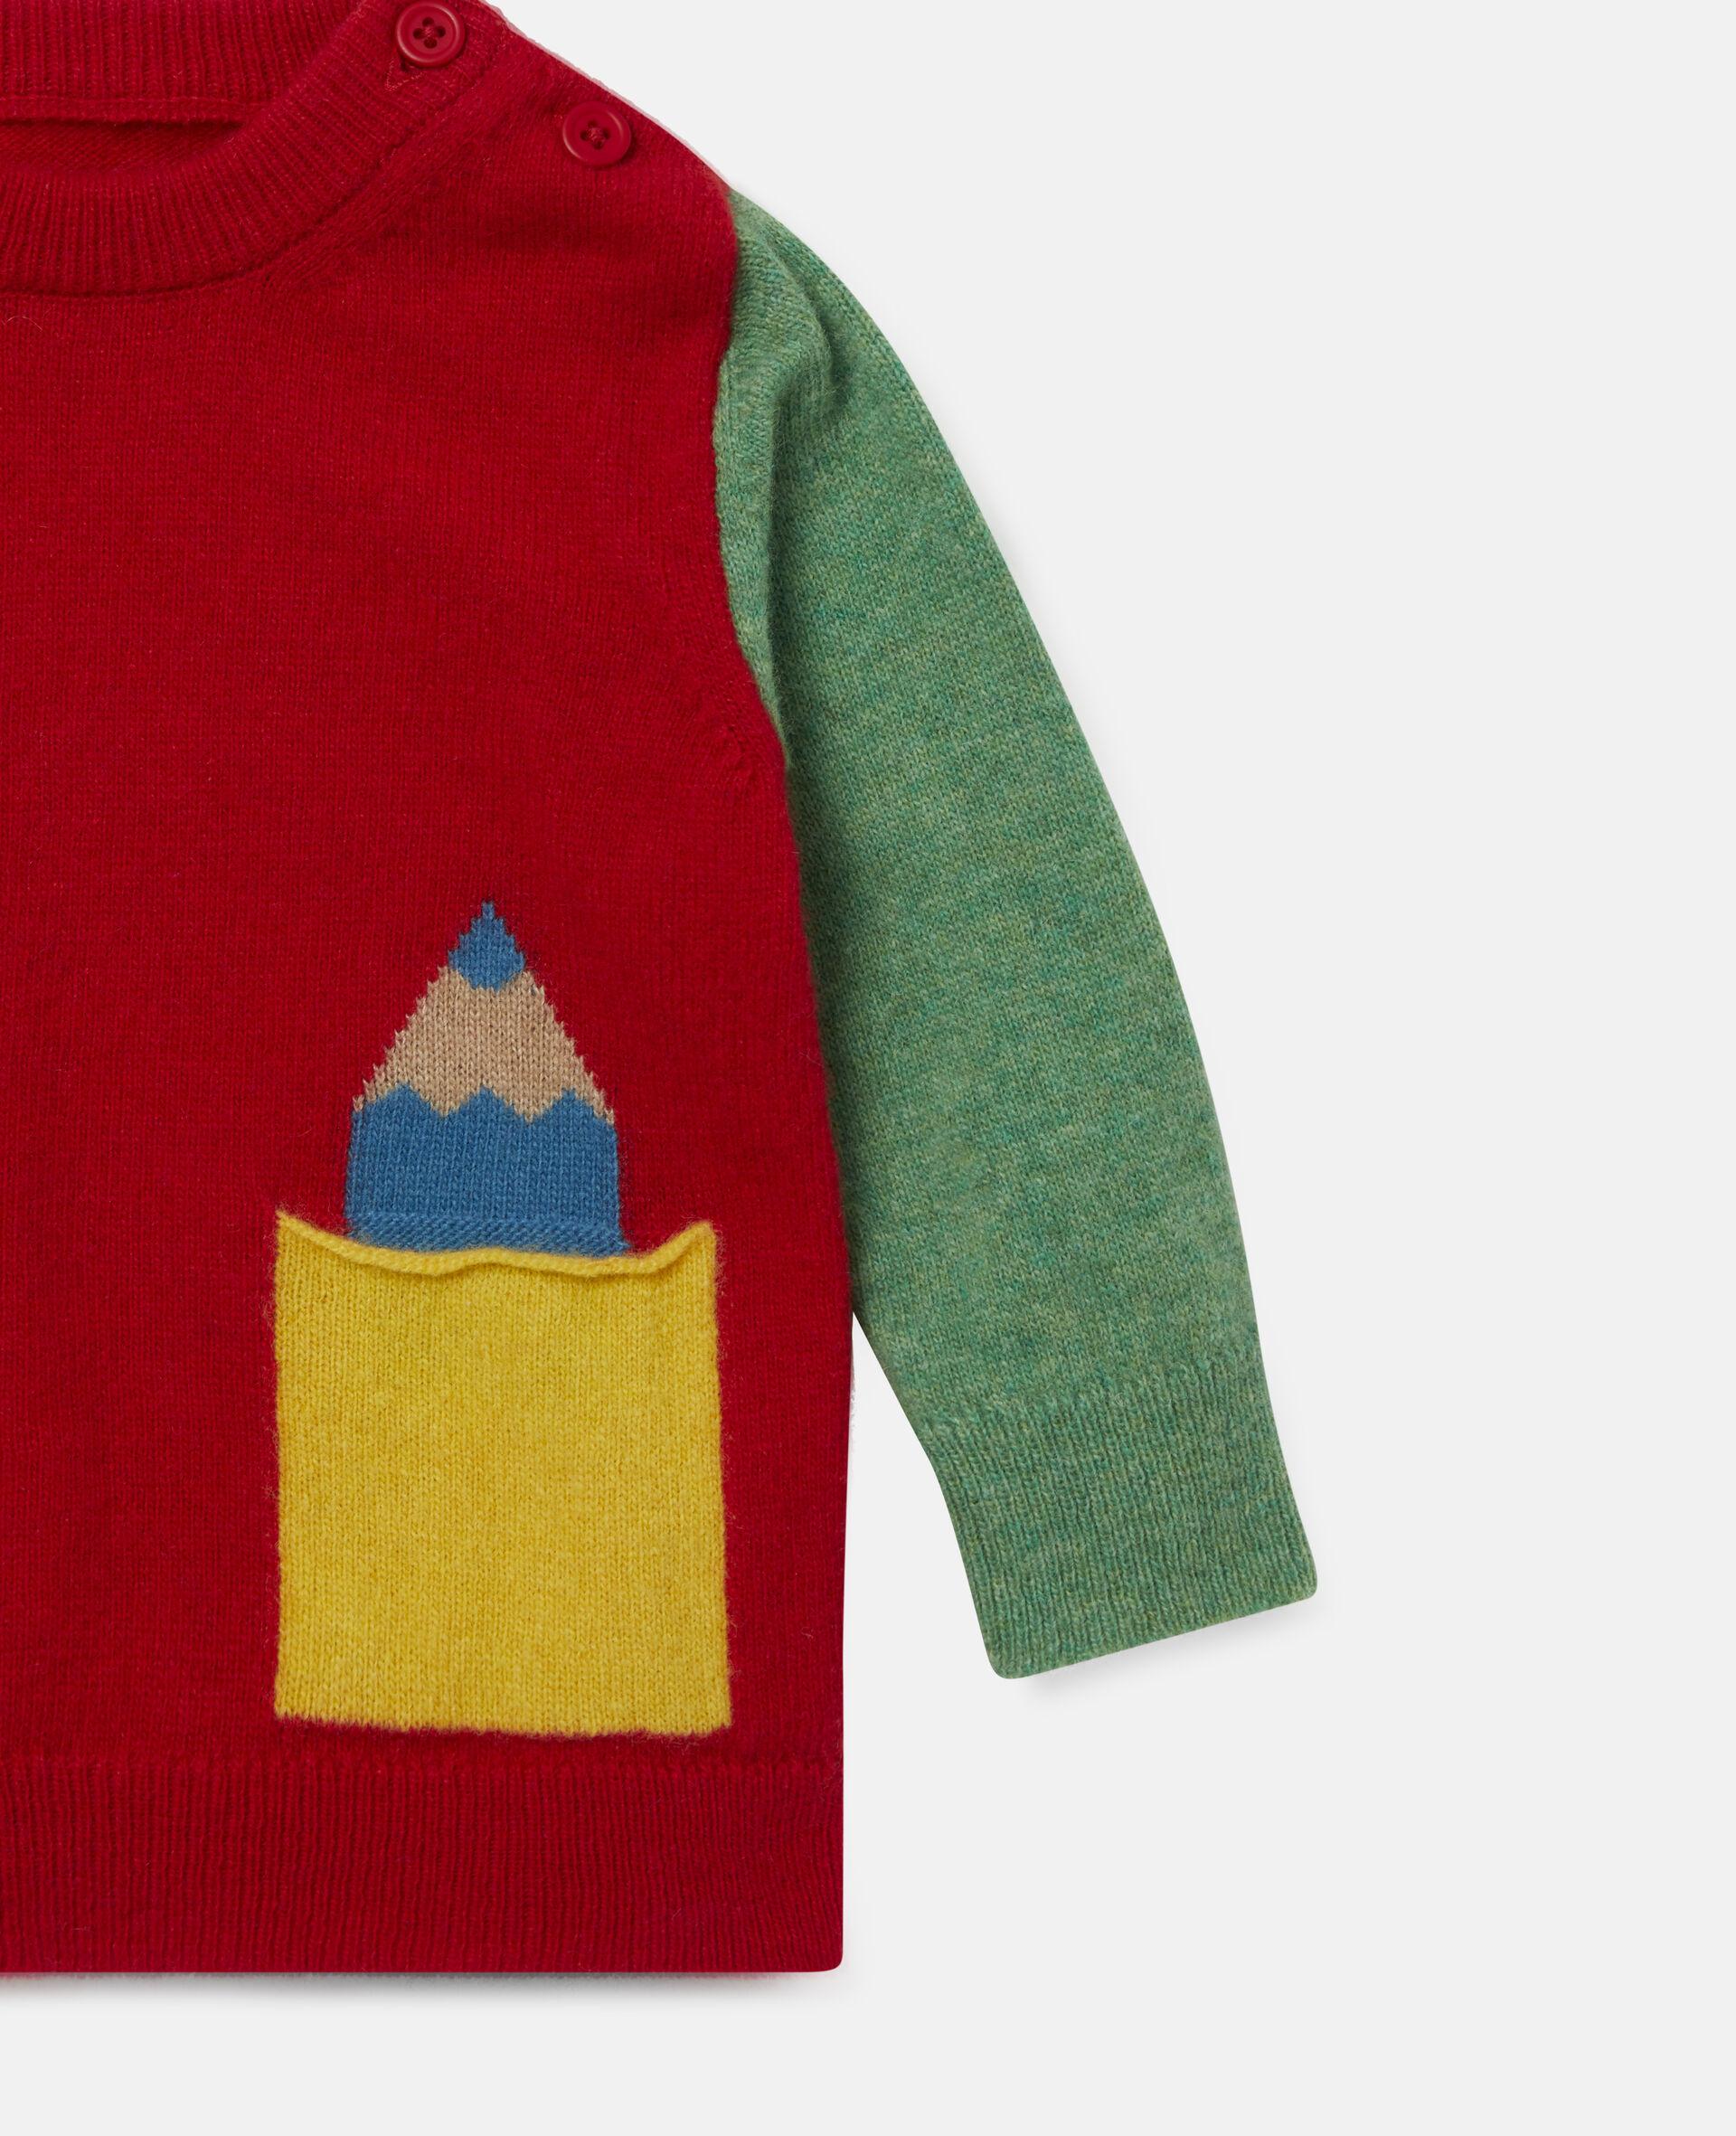 Strickpullover in Blockfarben-Design mit Intarsienmuster-Bunt-large image number 2